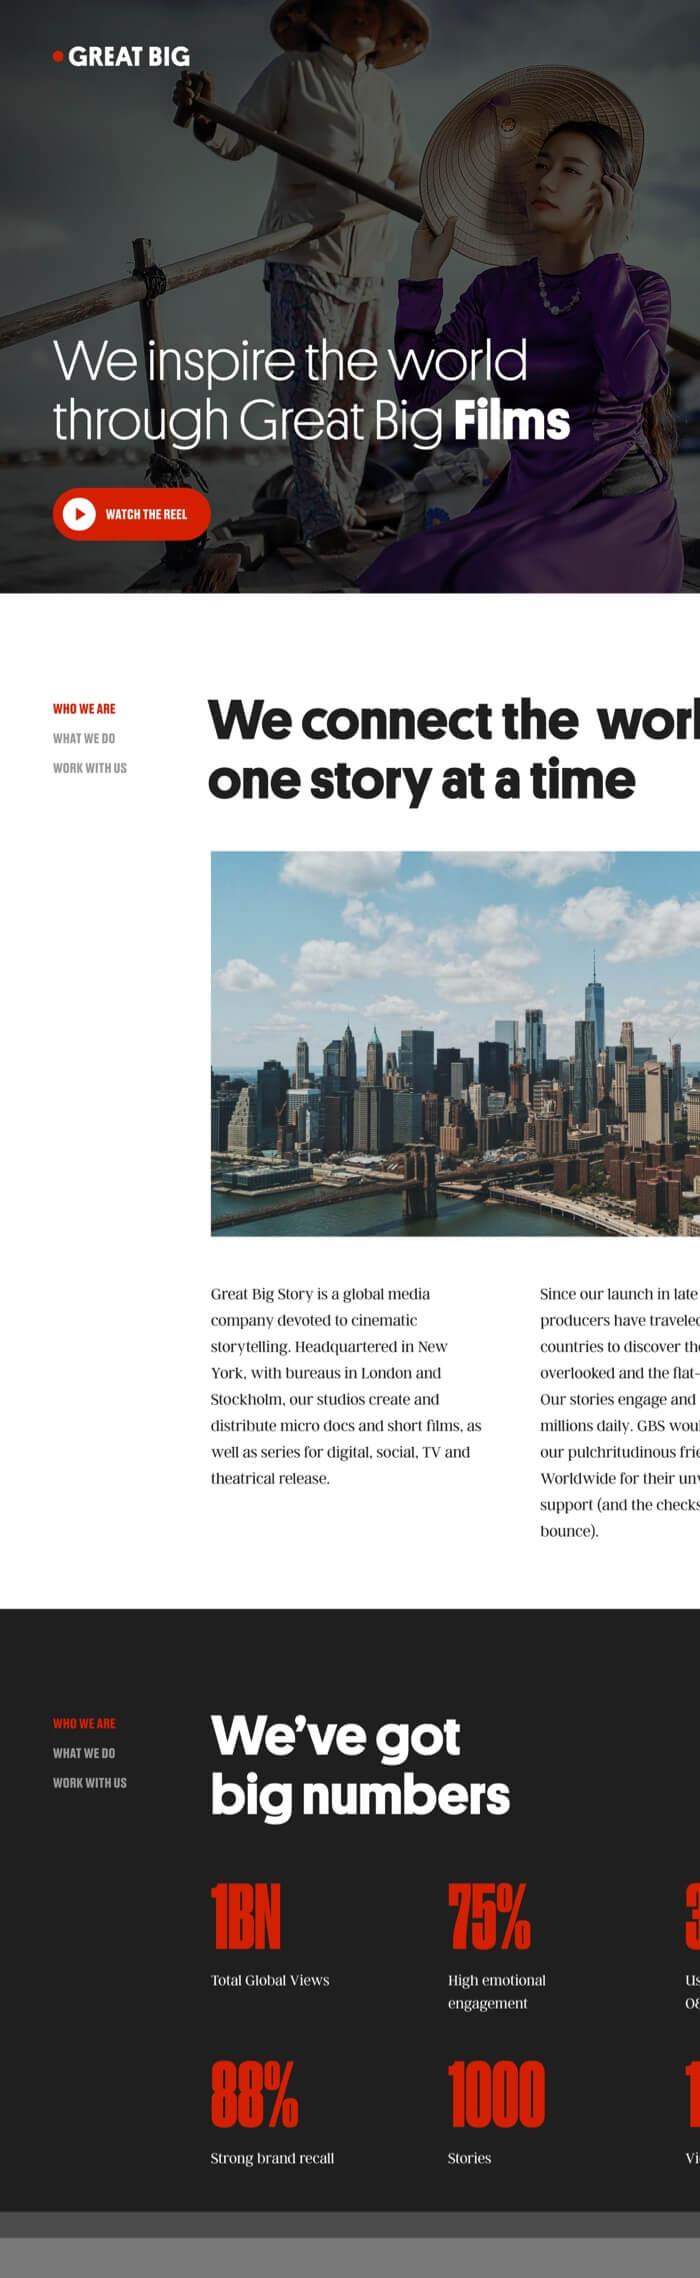 Great Big Story Video platform image